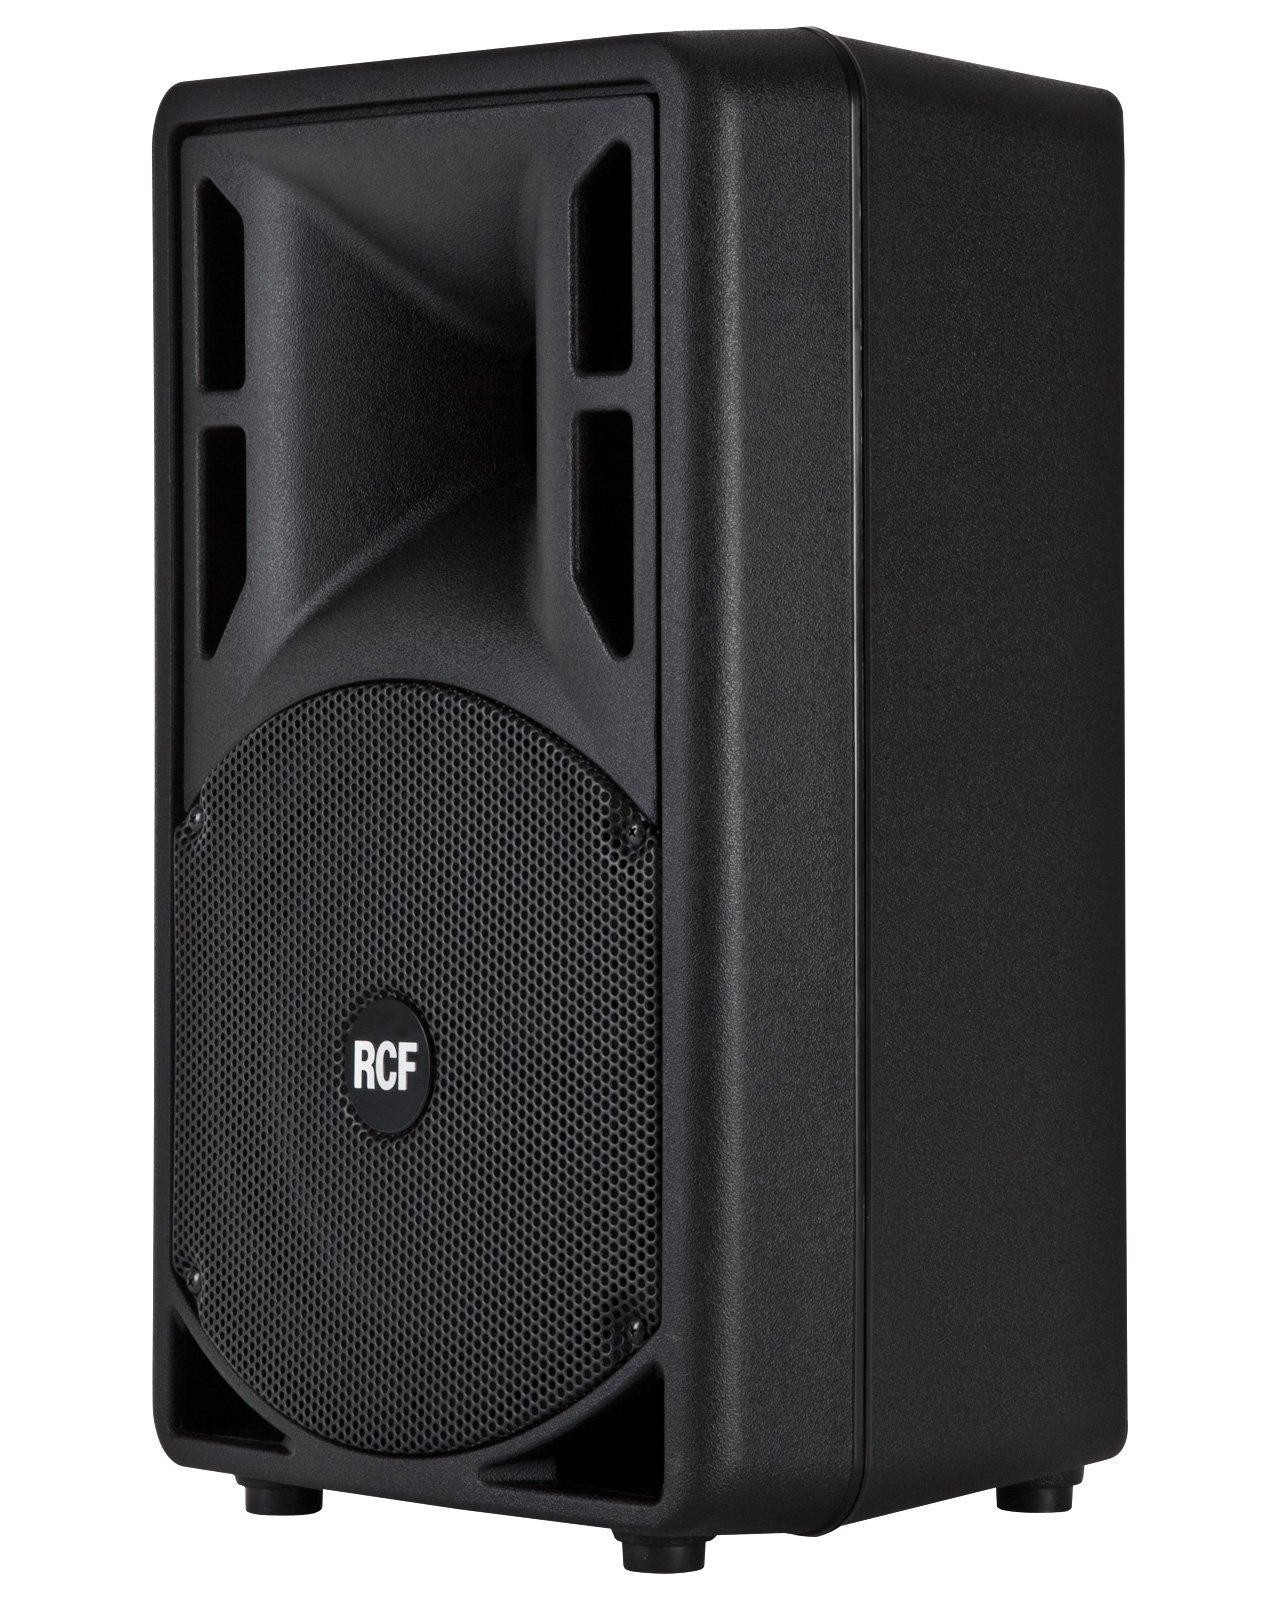 RCF højttaler ART312-A mk4 aktiv 400W